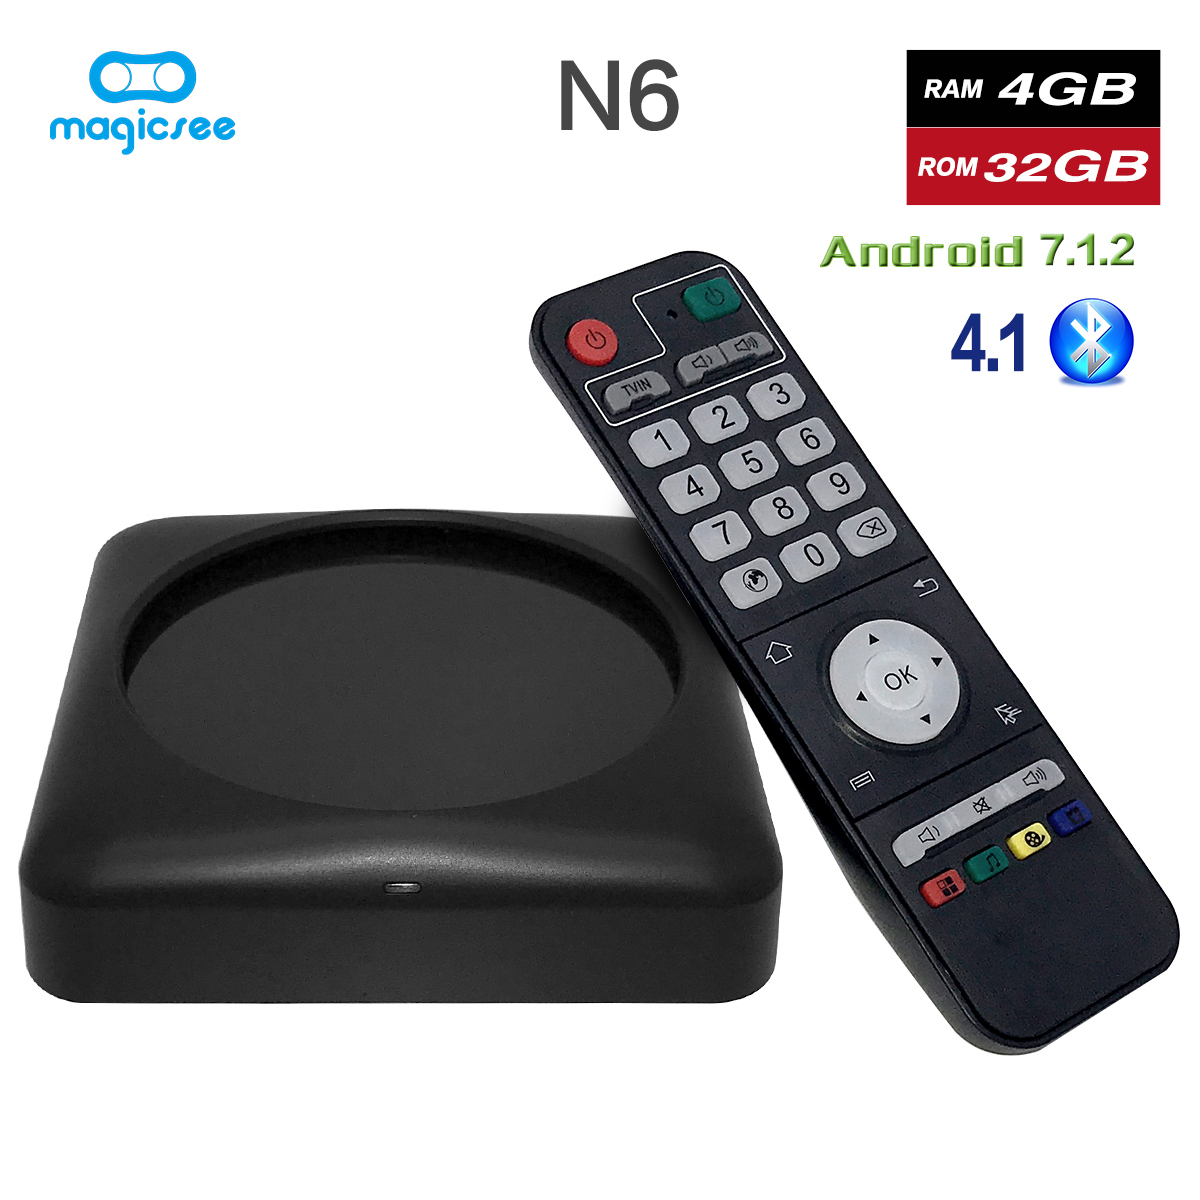 TV BOX N6 Max RK3399 Android 7.1 TV BOX 4G 32G Rom 2.4+5G Dual Wifi 1000M LAN BT 4.1 Smart Box 4K Set Top Box black_4 + 32GB British regulations